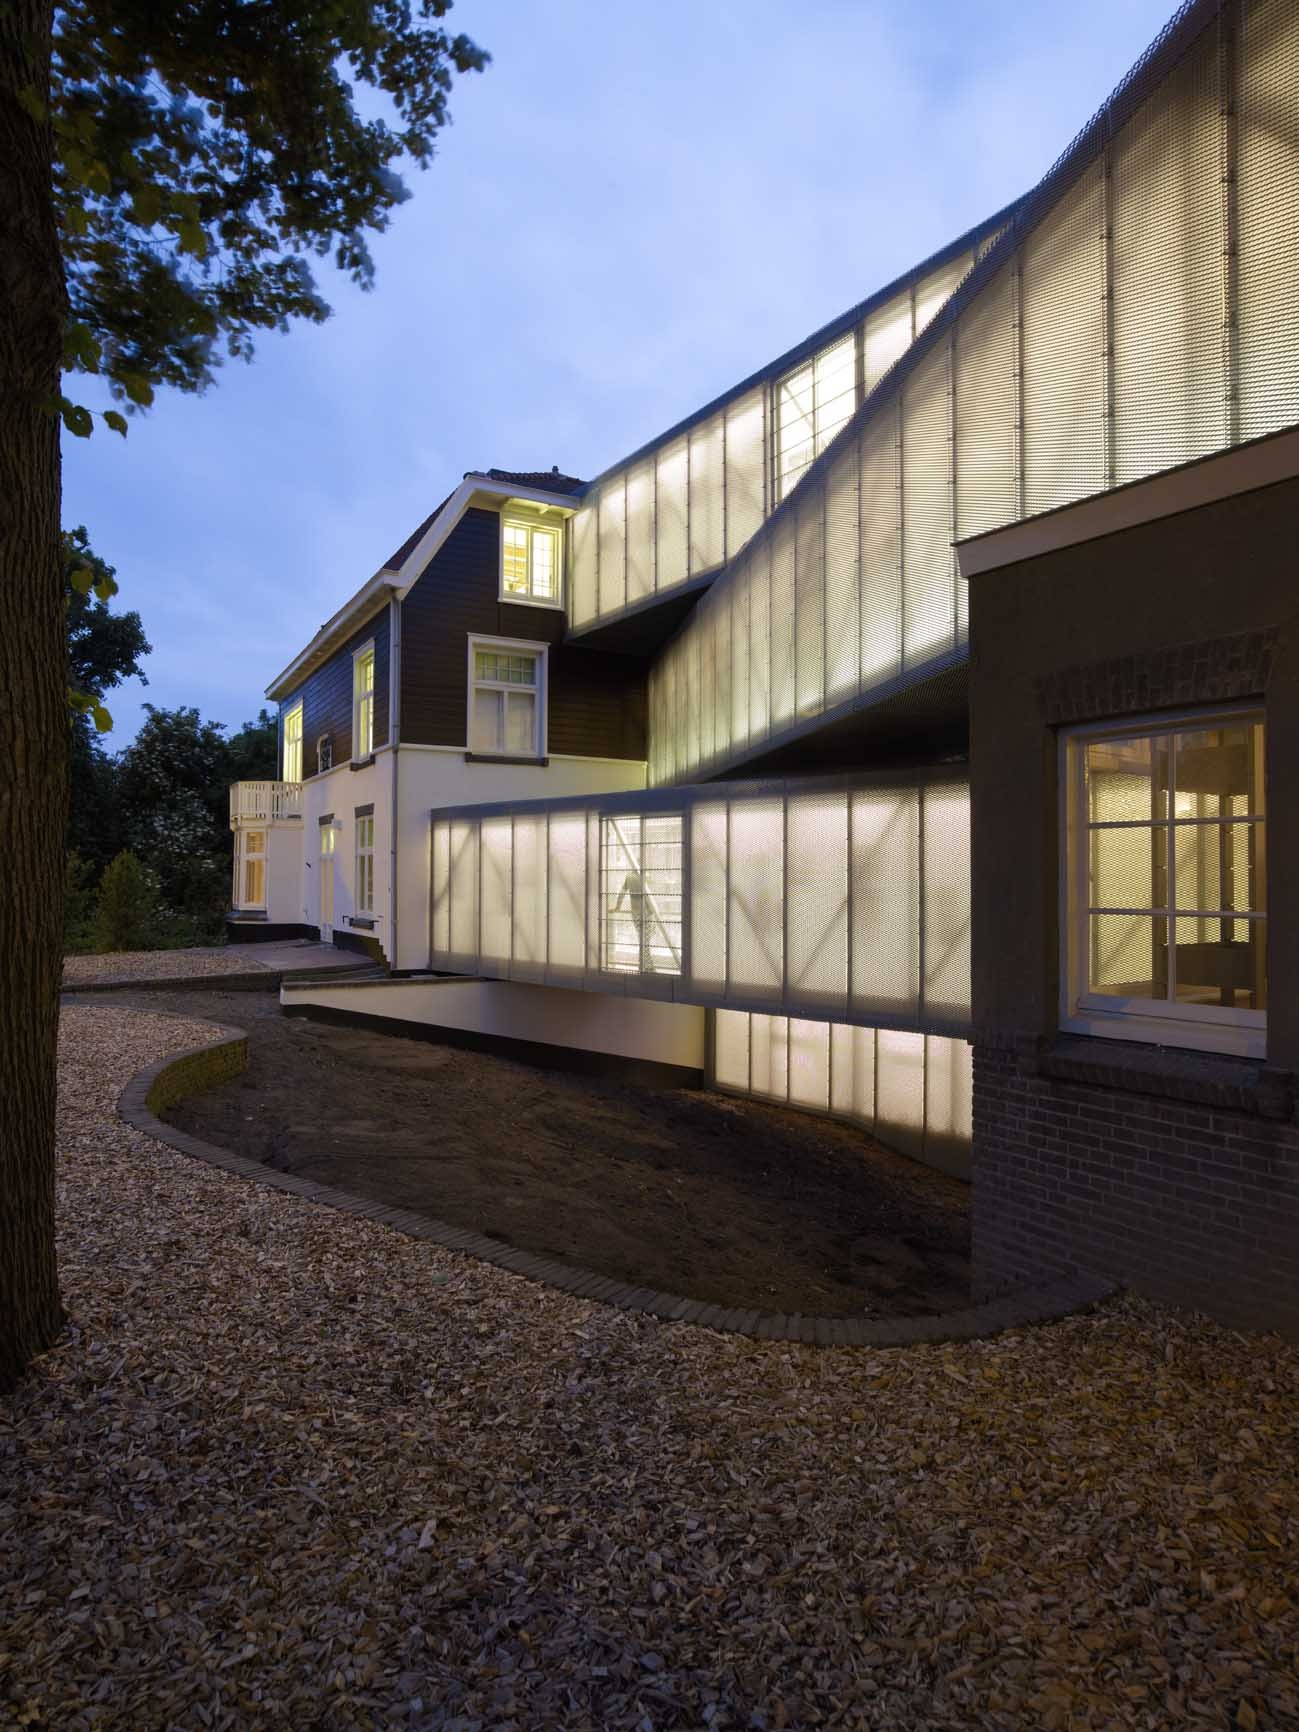 National Glass Museum / bureau SLA, Courtesy of  bureau sla